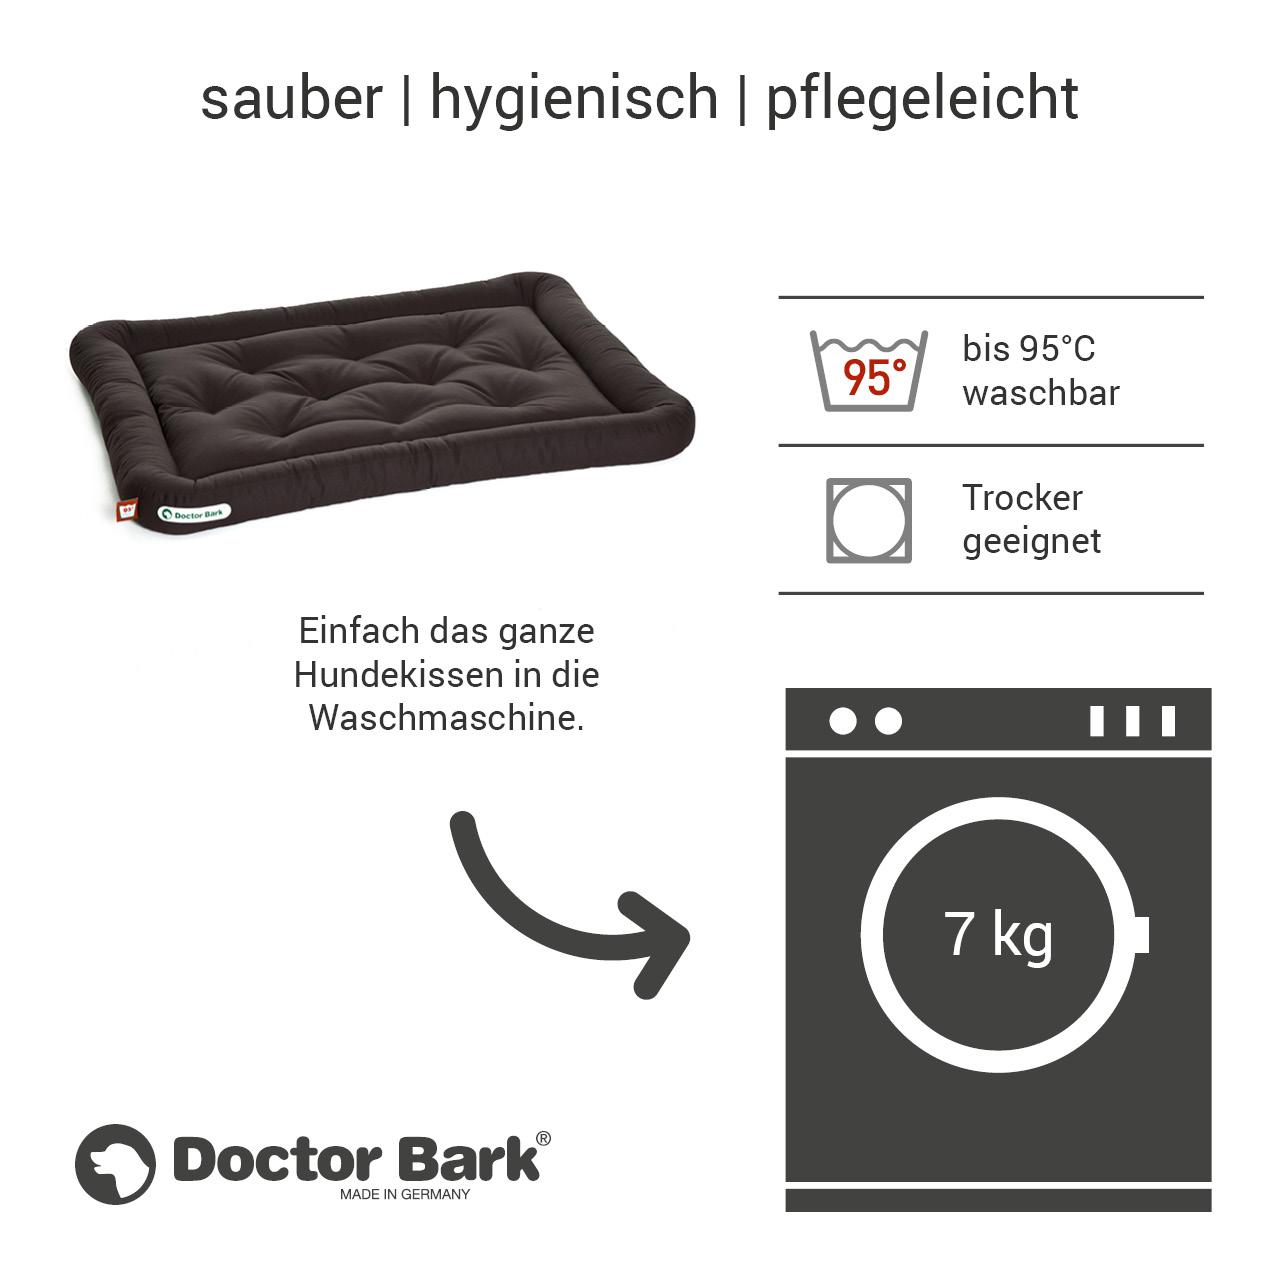 Lounge-Hundekissen / Hundebett orthopädisch Doctor Bark waschbar braun - Gr. L